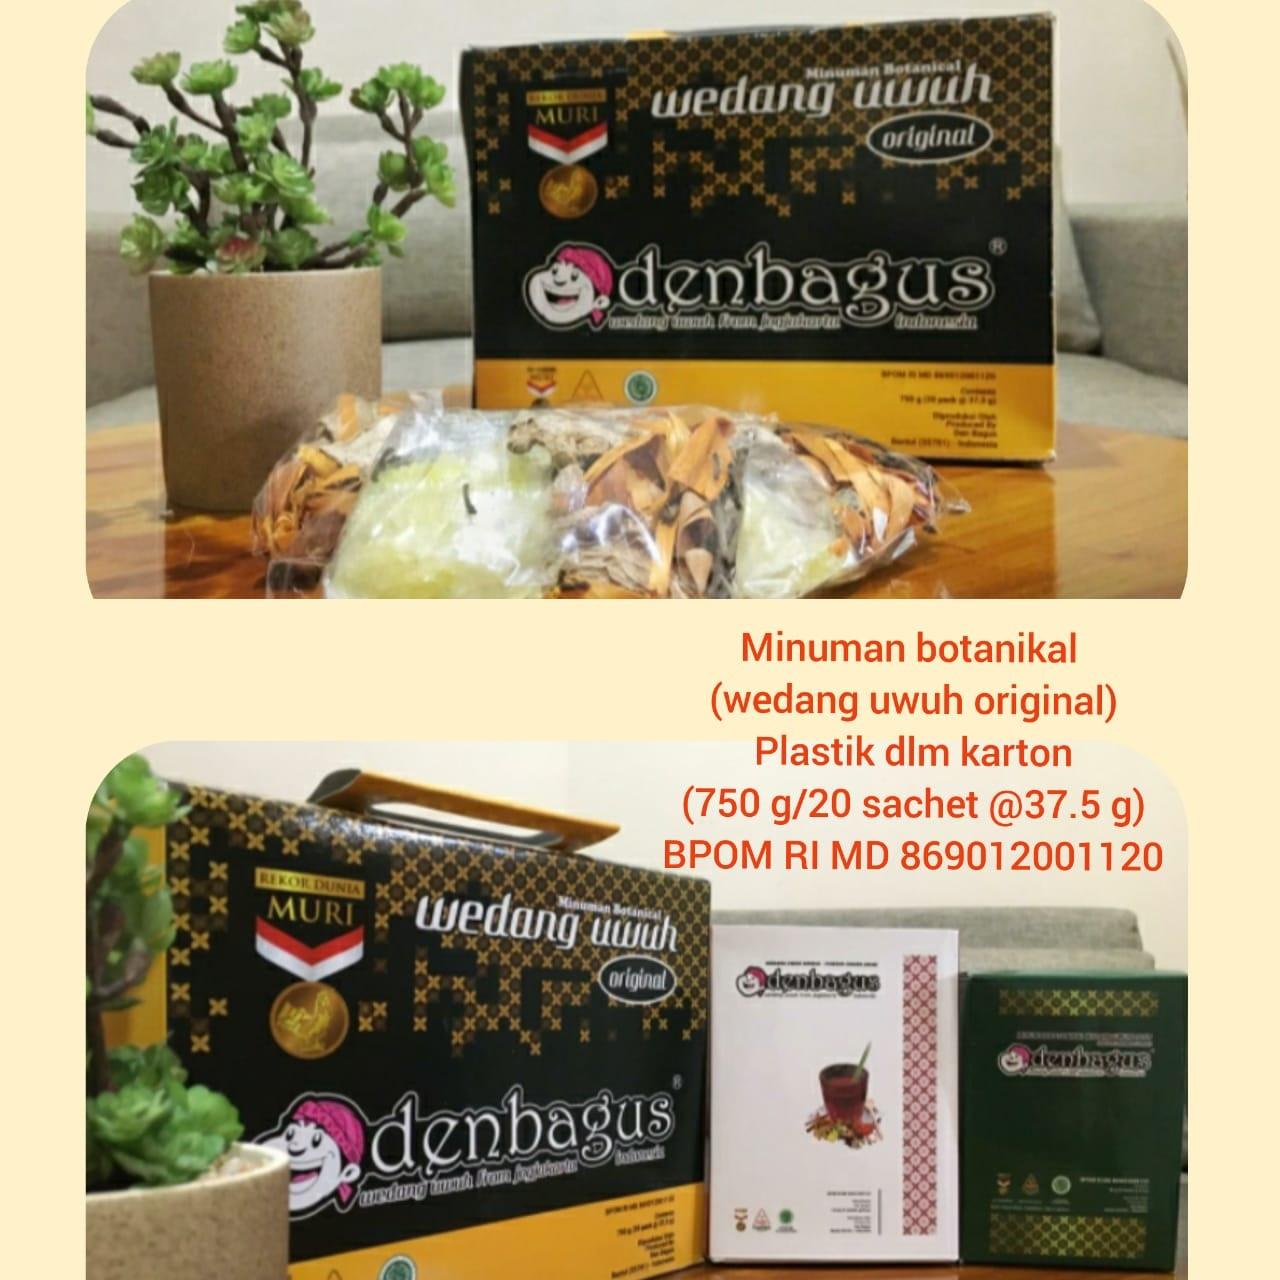 Varian produk Wedang Uwuh Den Bagus